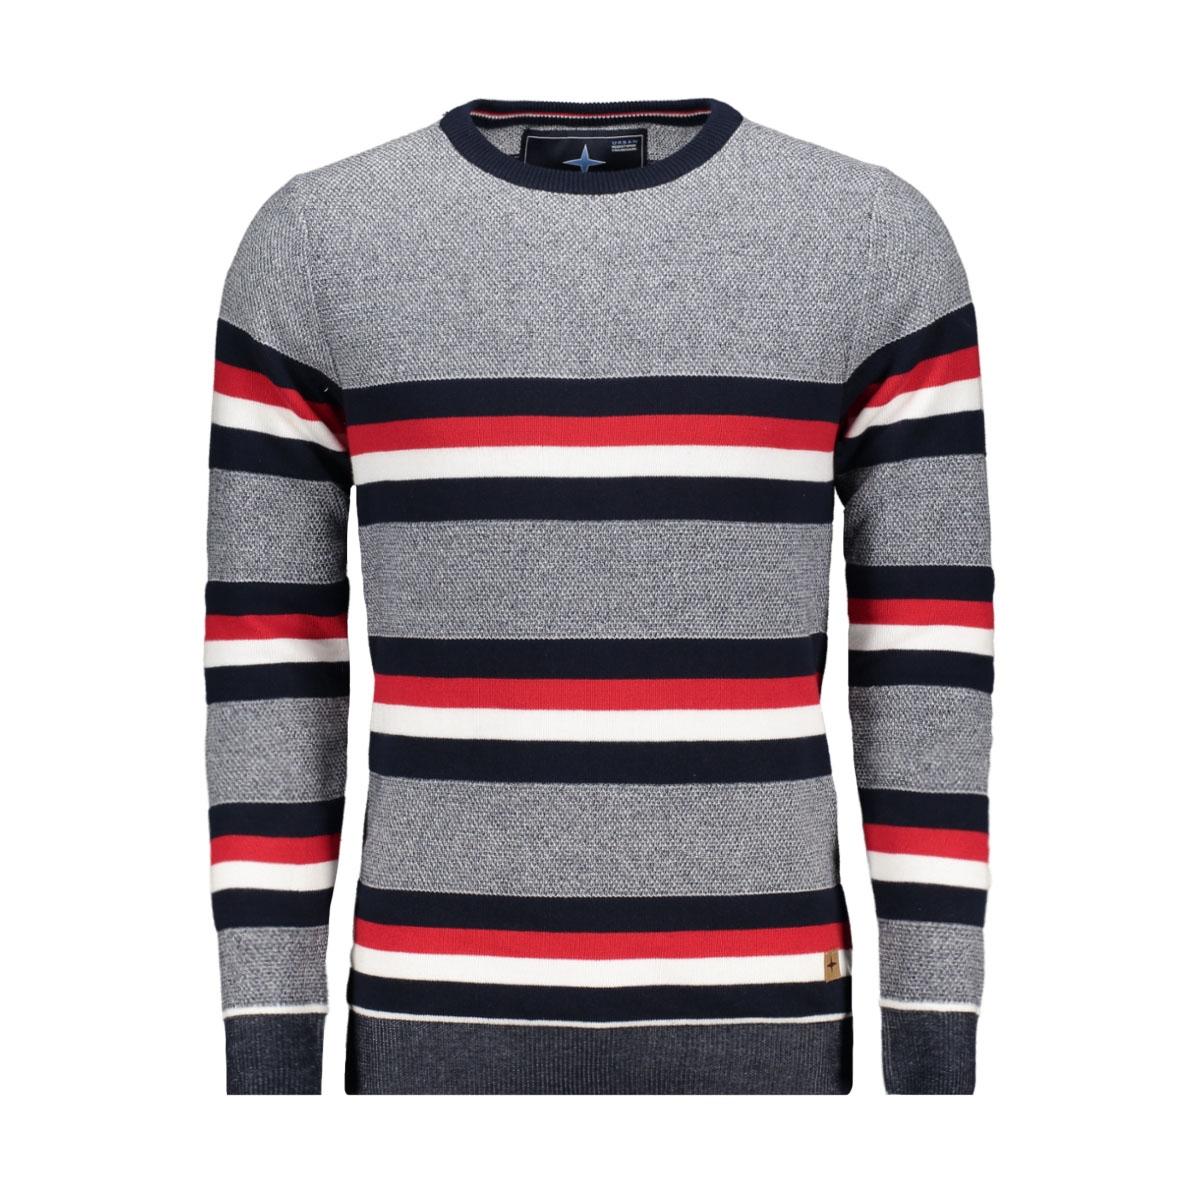 knit double fabric mu11 0210 haze & finn trui navy-red-white